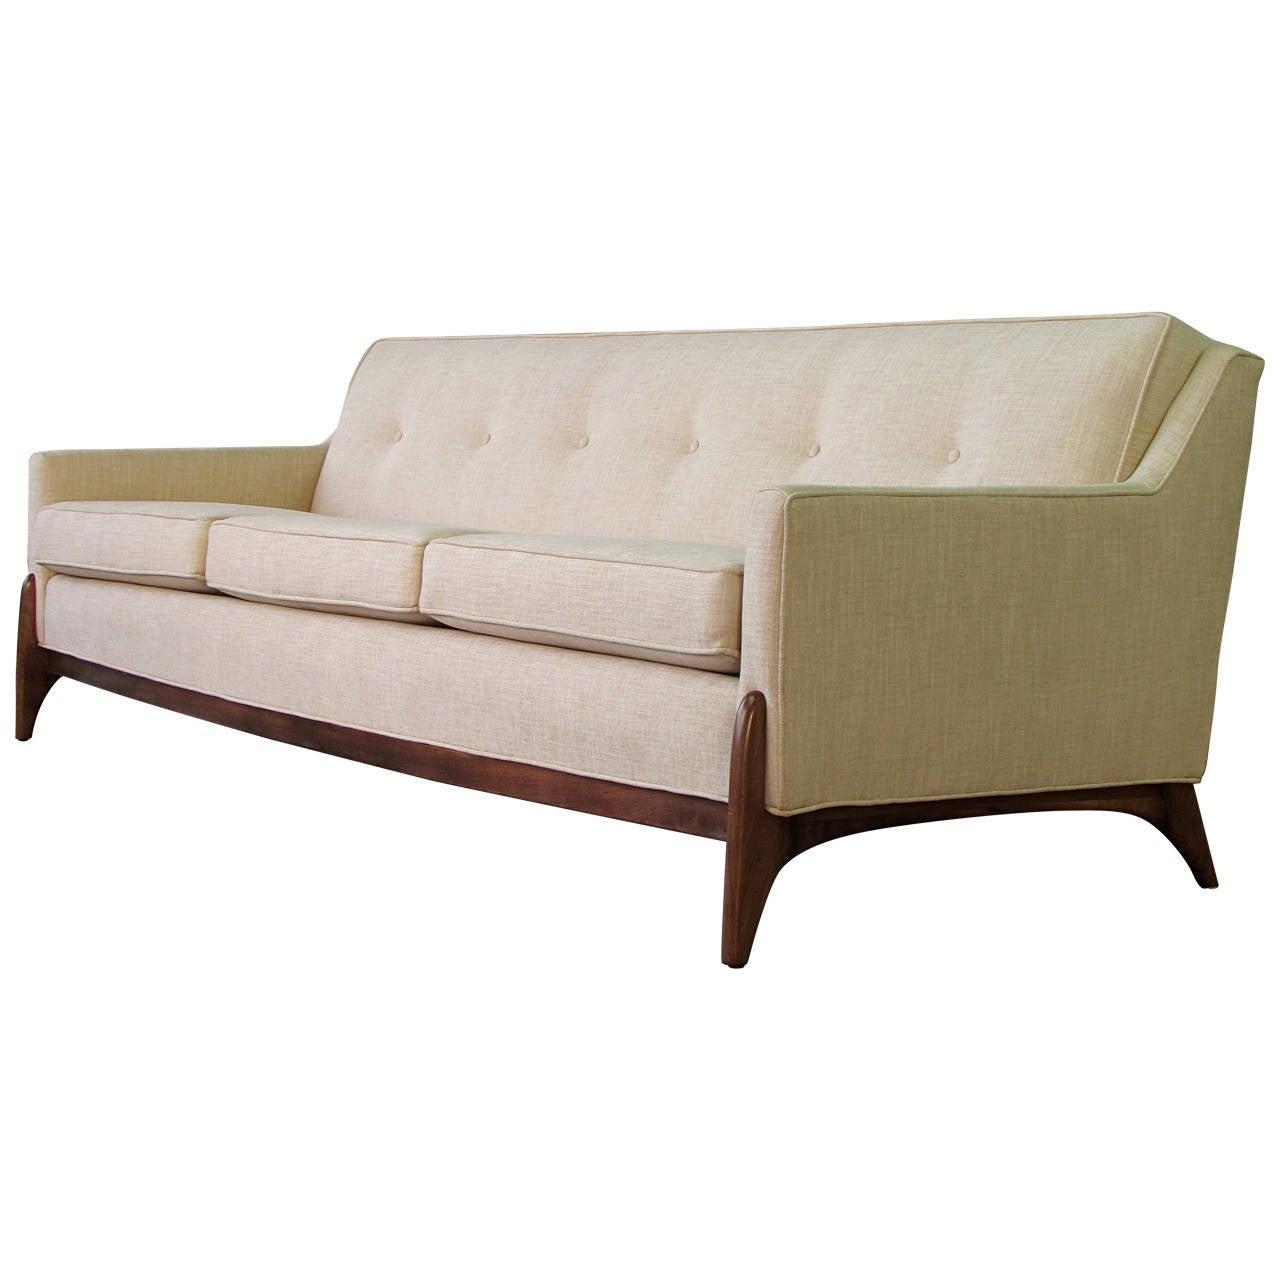 Stunning Mid Century Modern Sofa With Sculptural Legs